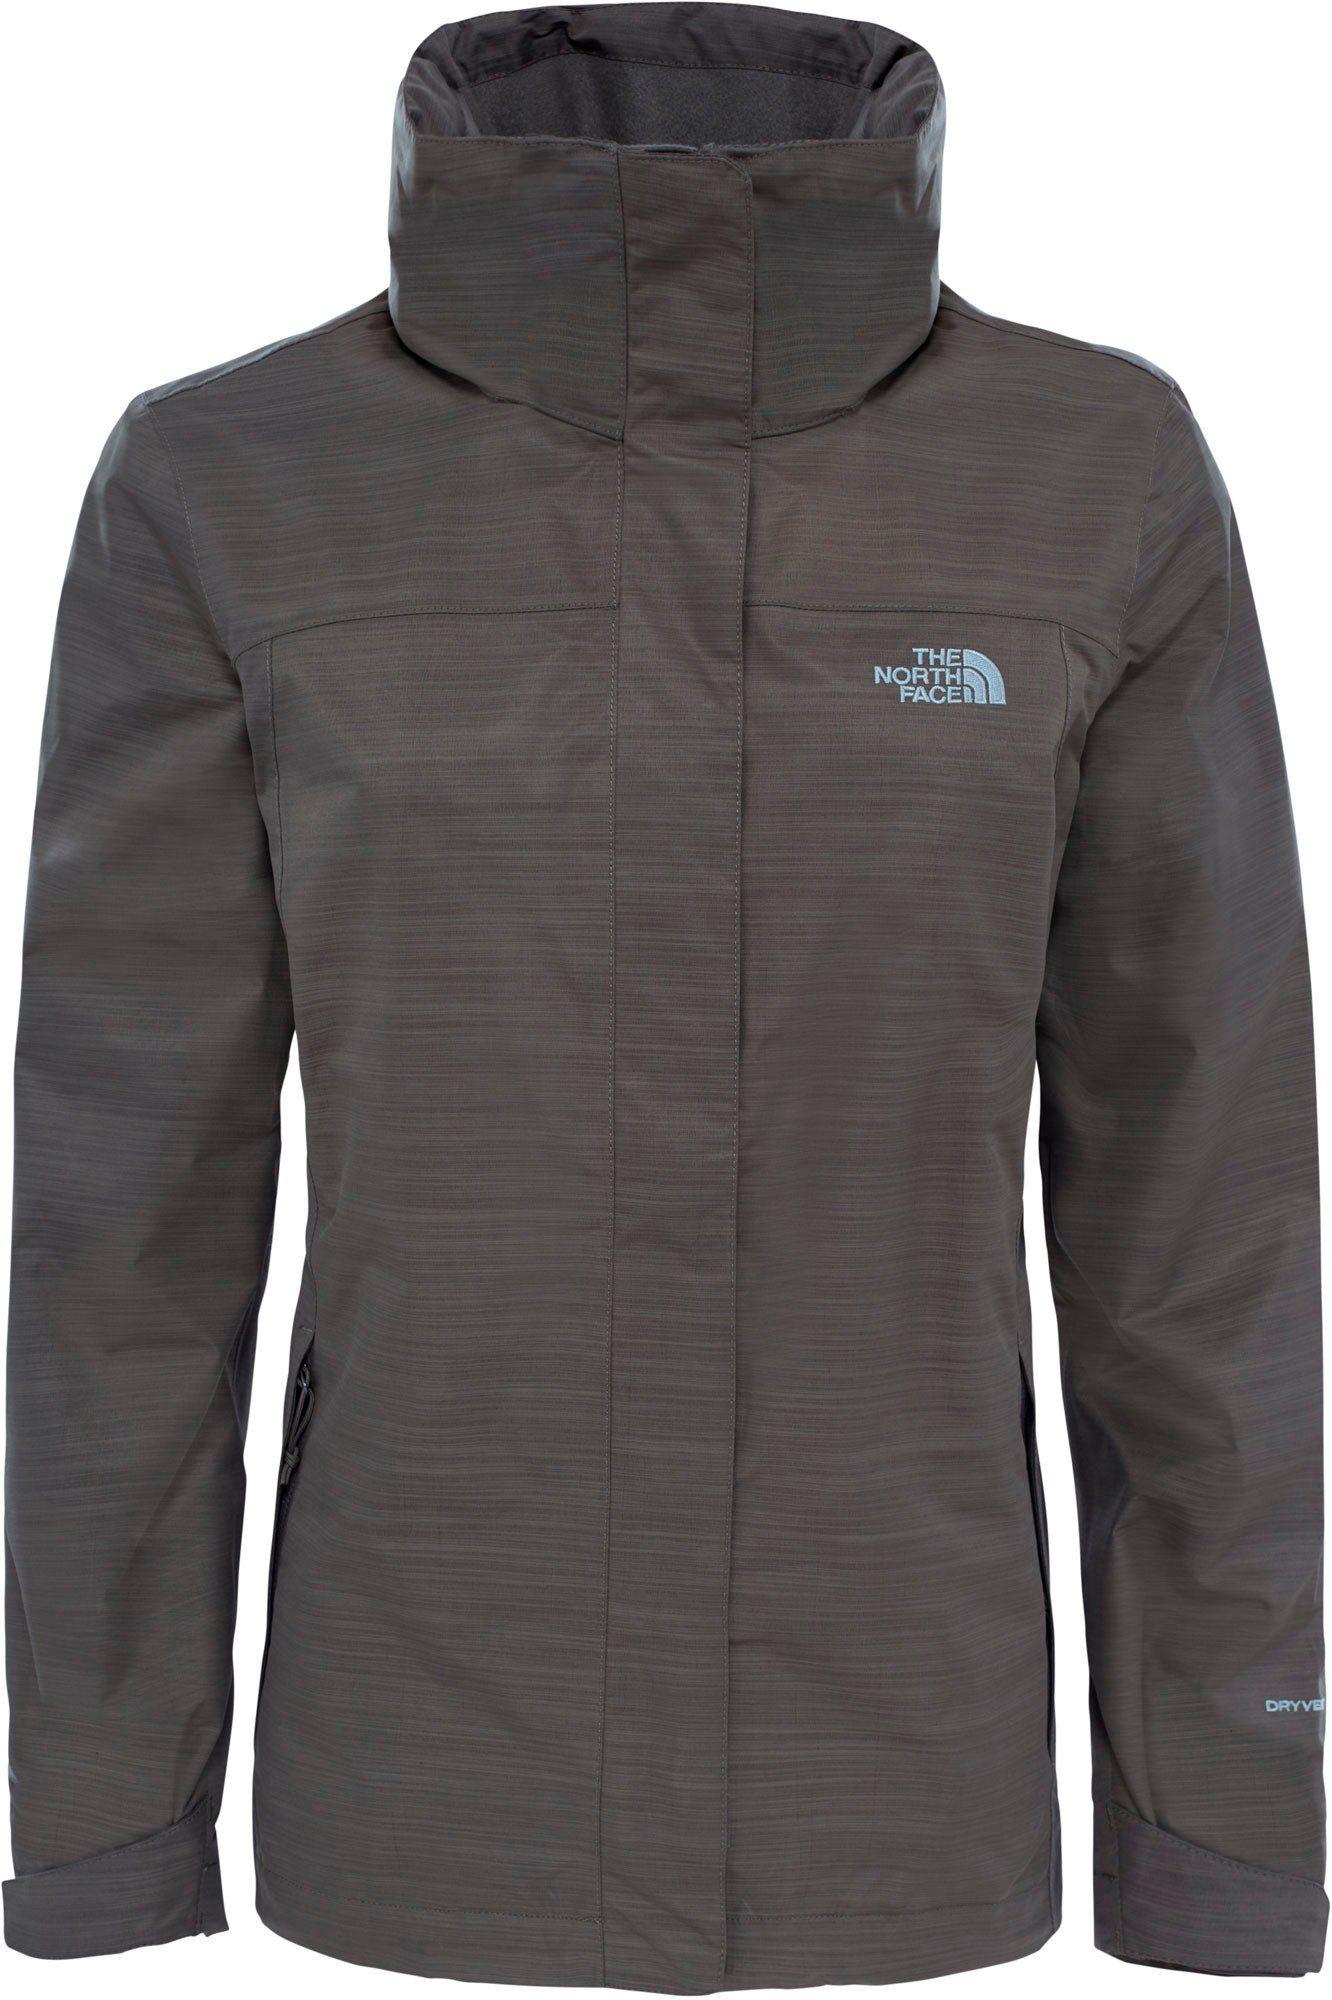 The North Face Outdoorjacke »Lowland Jacket Women«